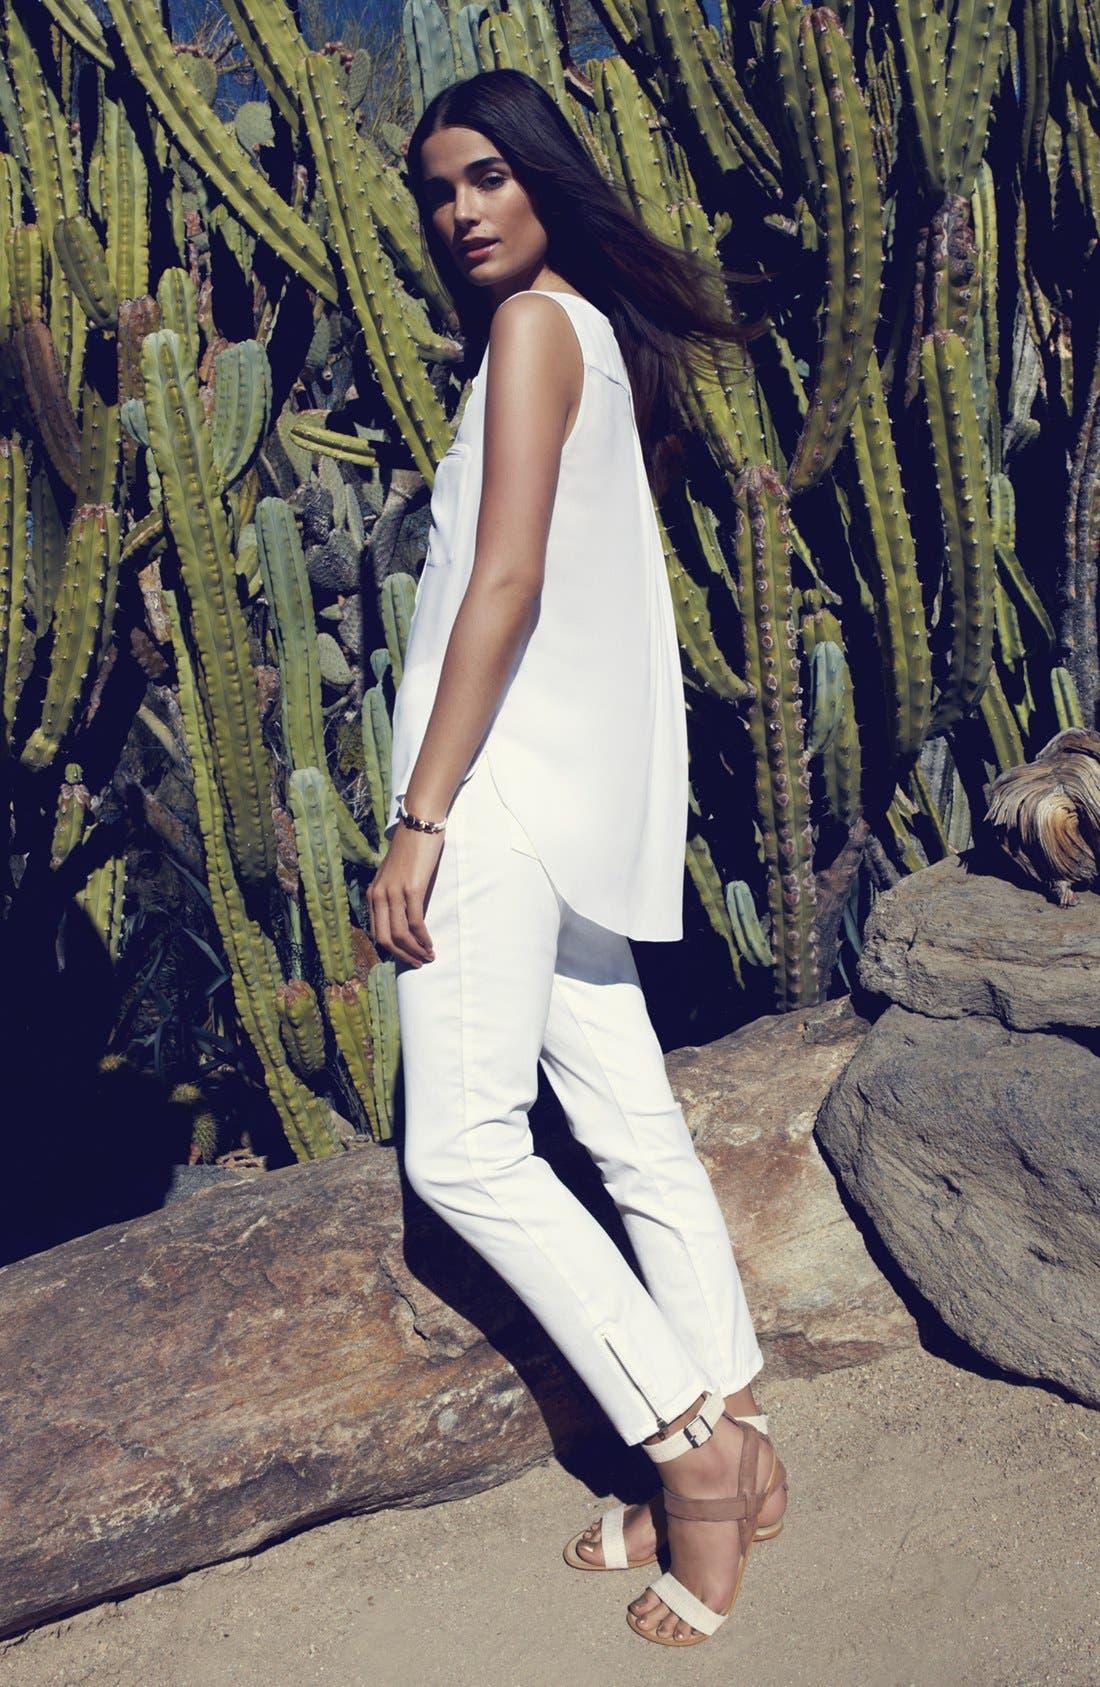 Alternate Image 1 Selected - NYDJ Blouse & 'Angelina' Denim Leggings